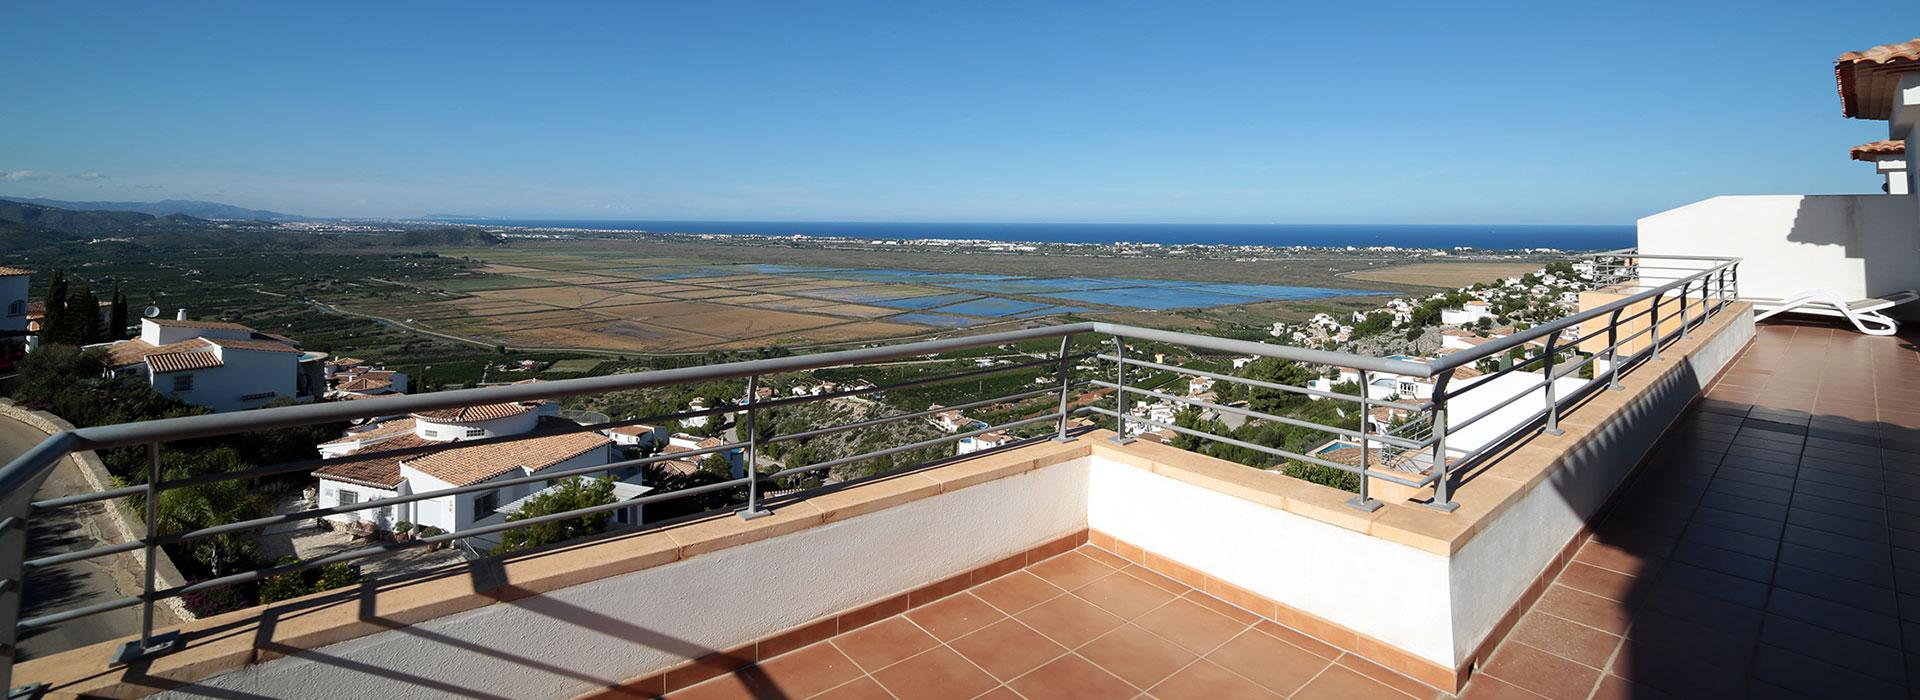 Acheter sur la Costa Blanca - Denia - Monte Pego - Appartement CIMA 23